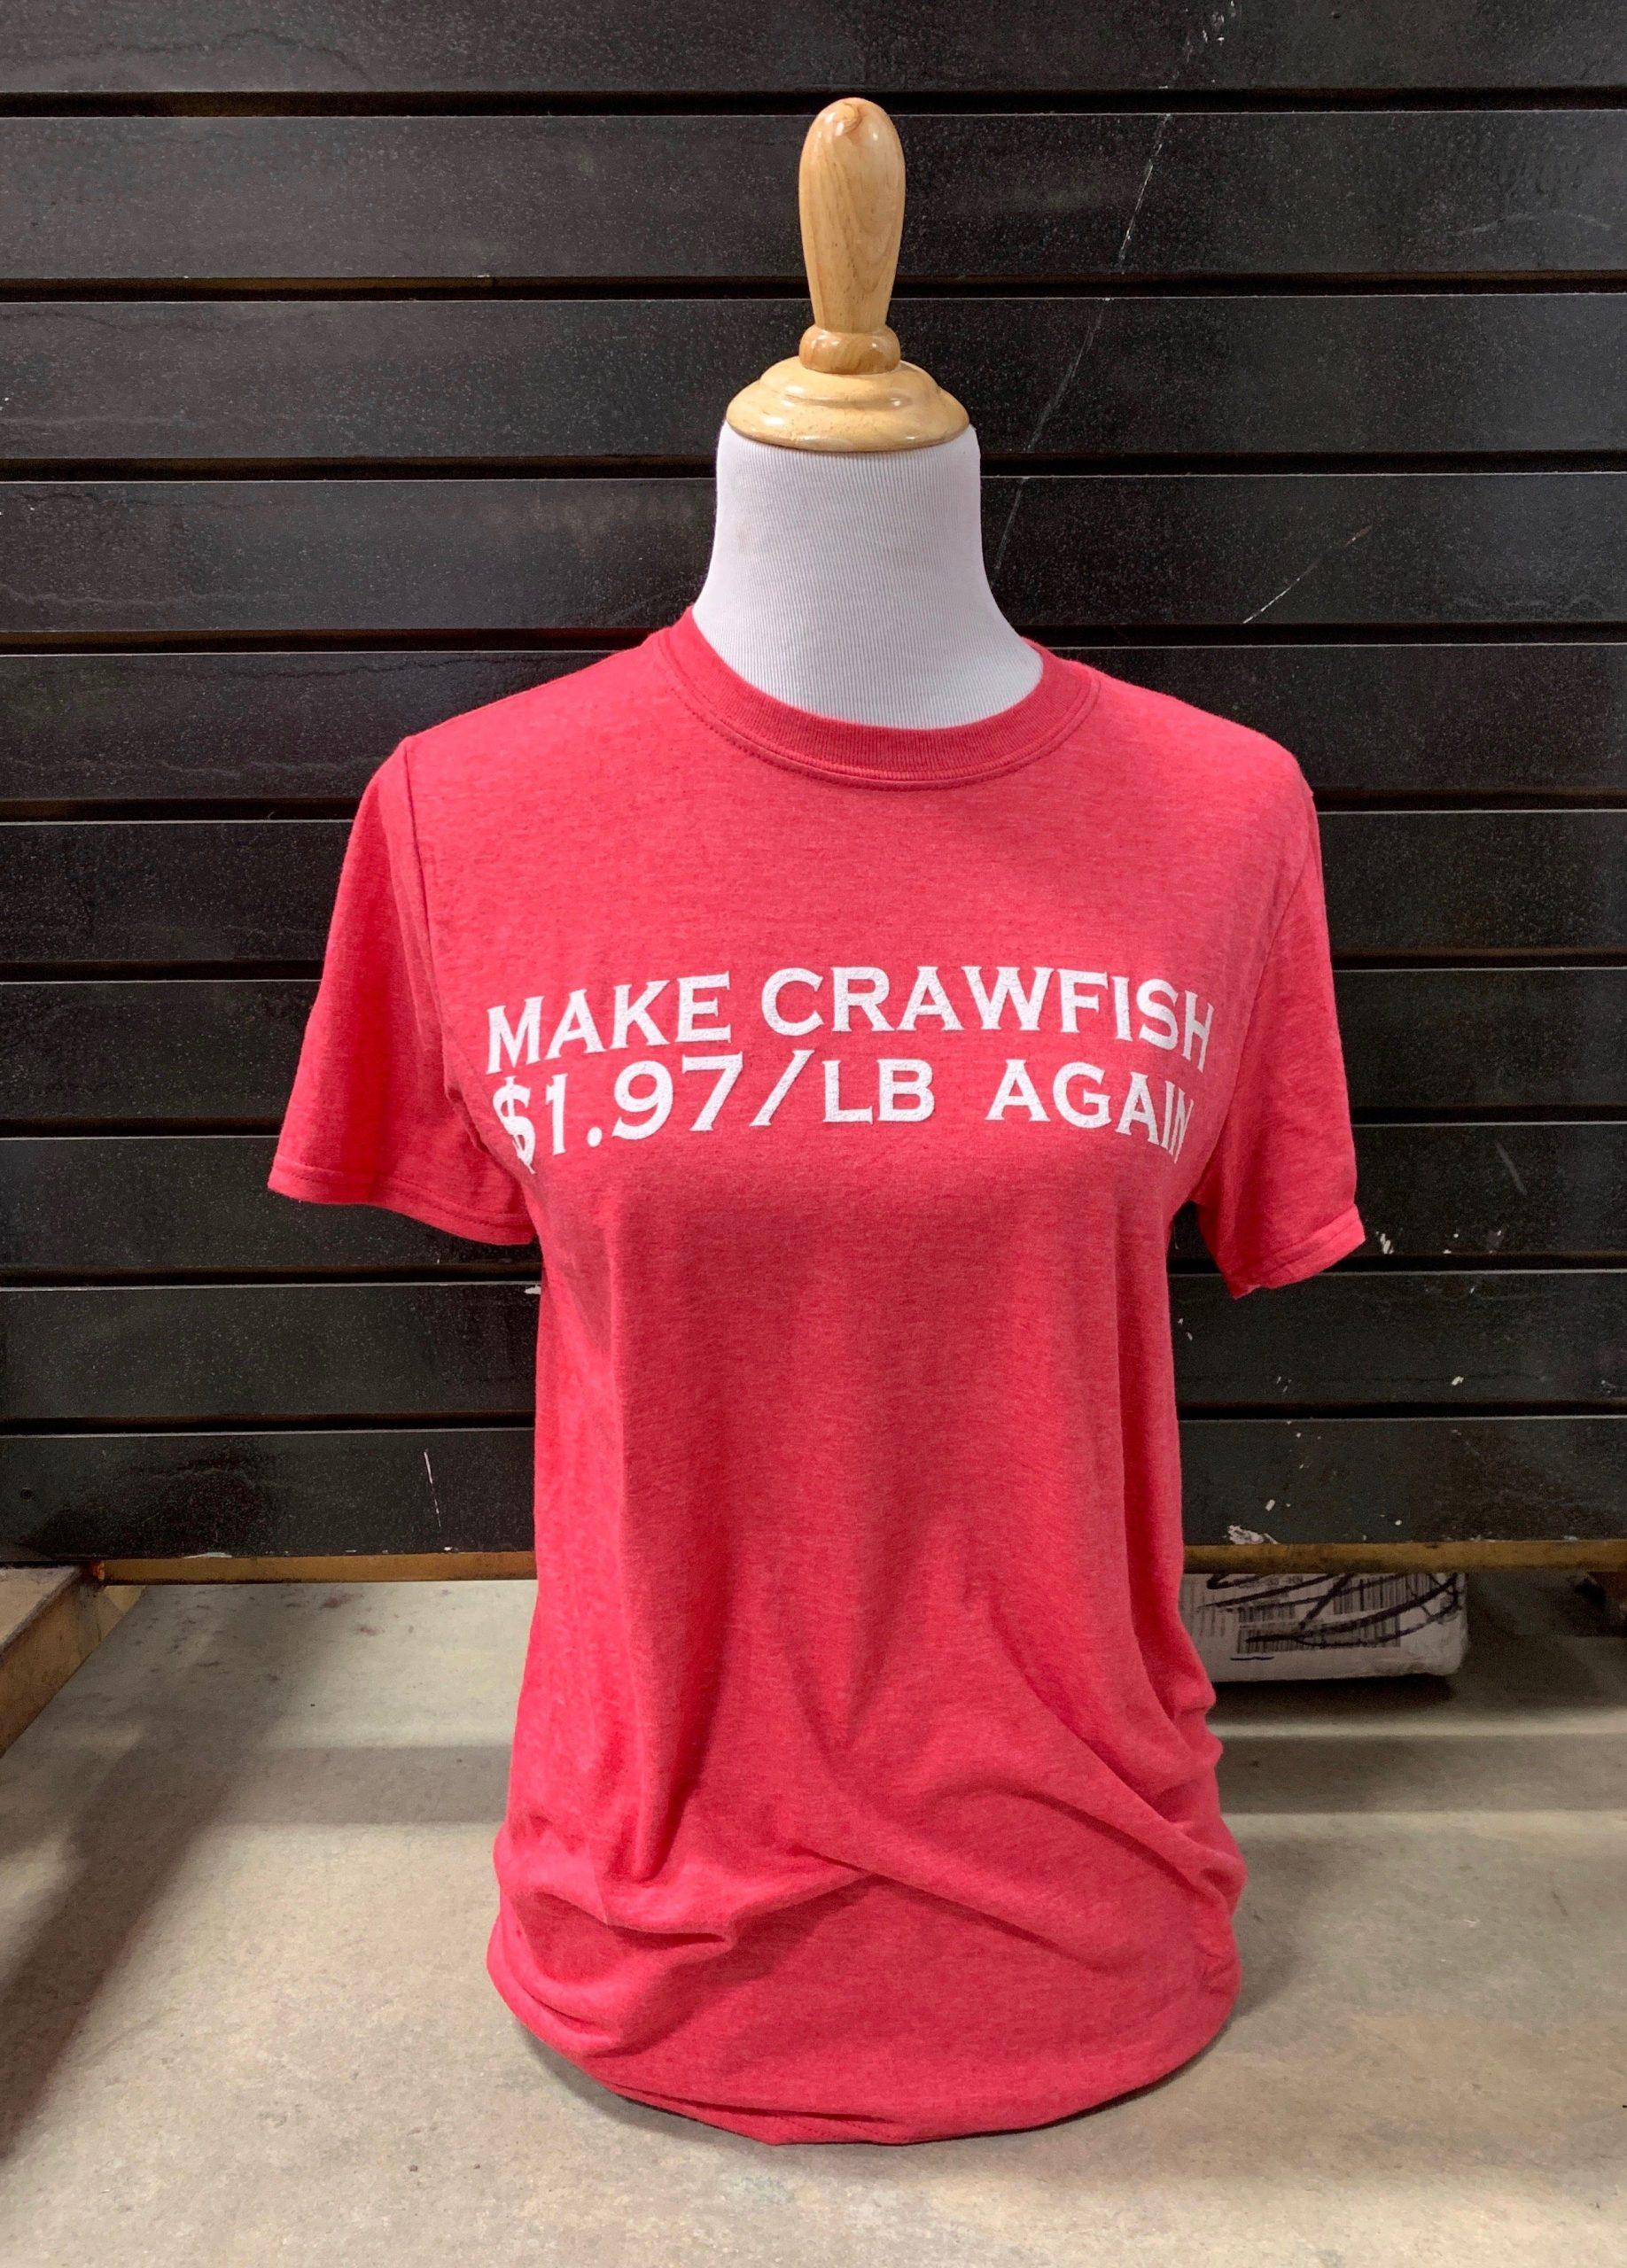 Make Crawfish $1.97/Lb. Again on Red Tee